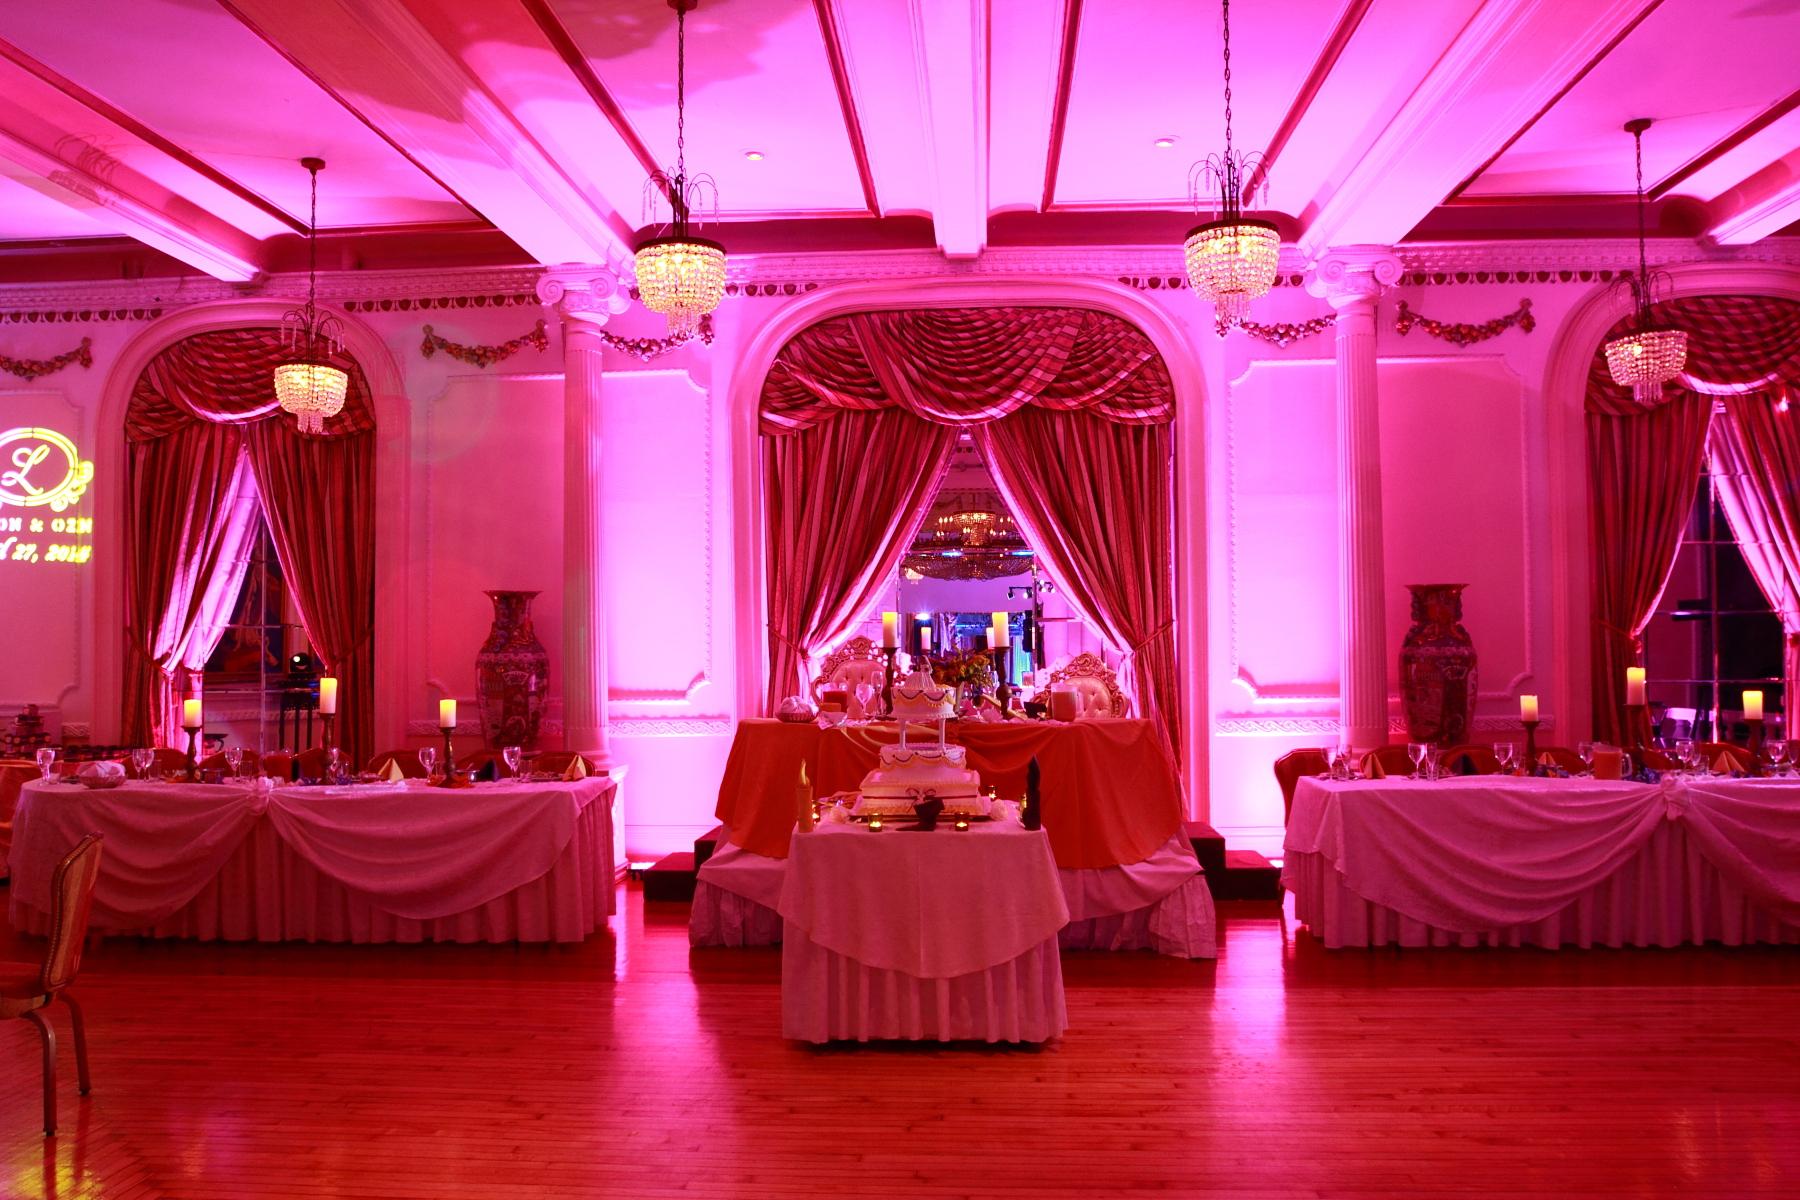 Uplifting, Grand Prospect Ballroom